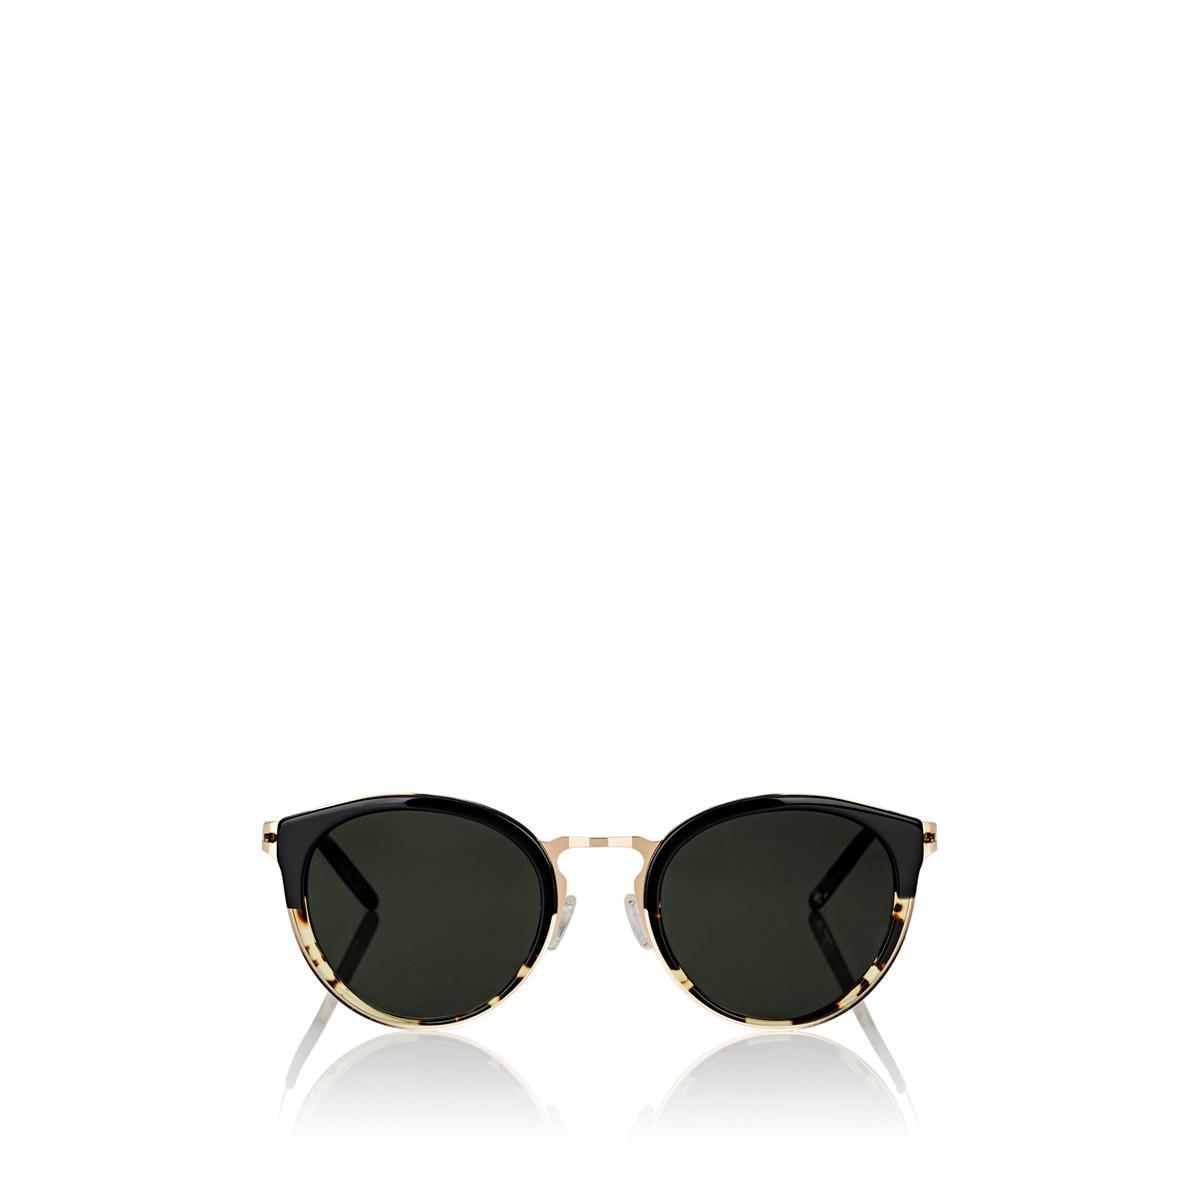 0ec134bdca2 Lyst - Barton Perreira A050 Sunglasses in Black